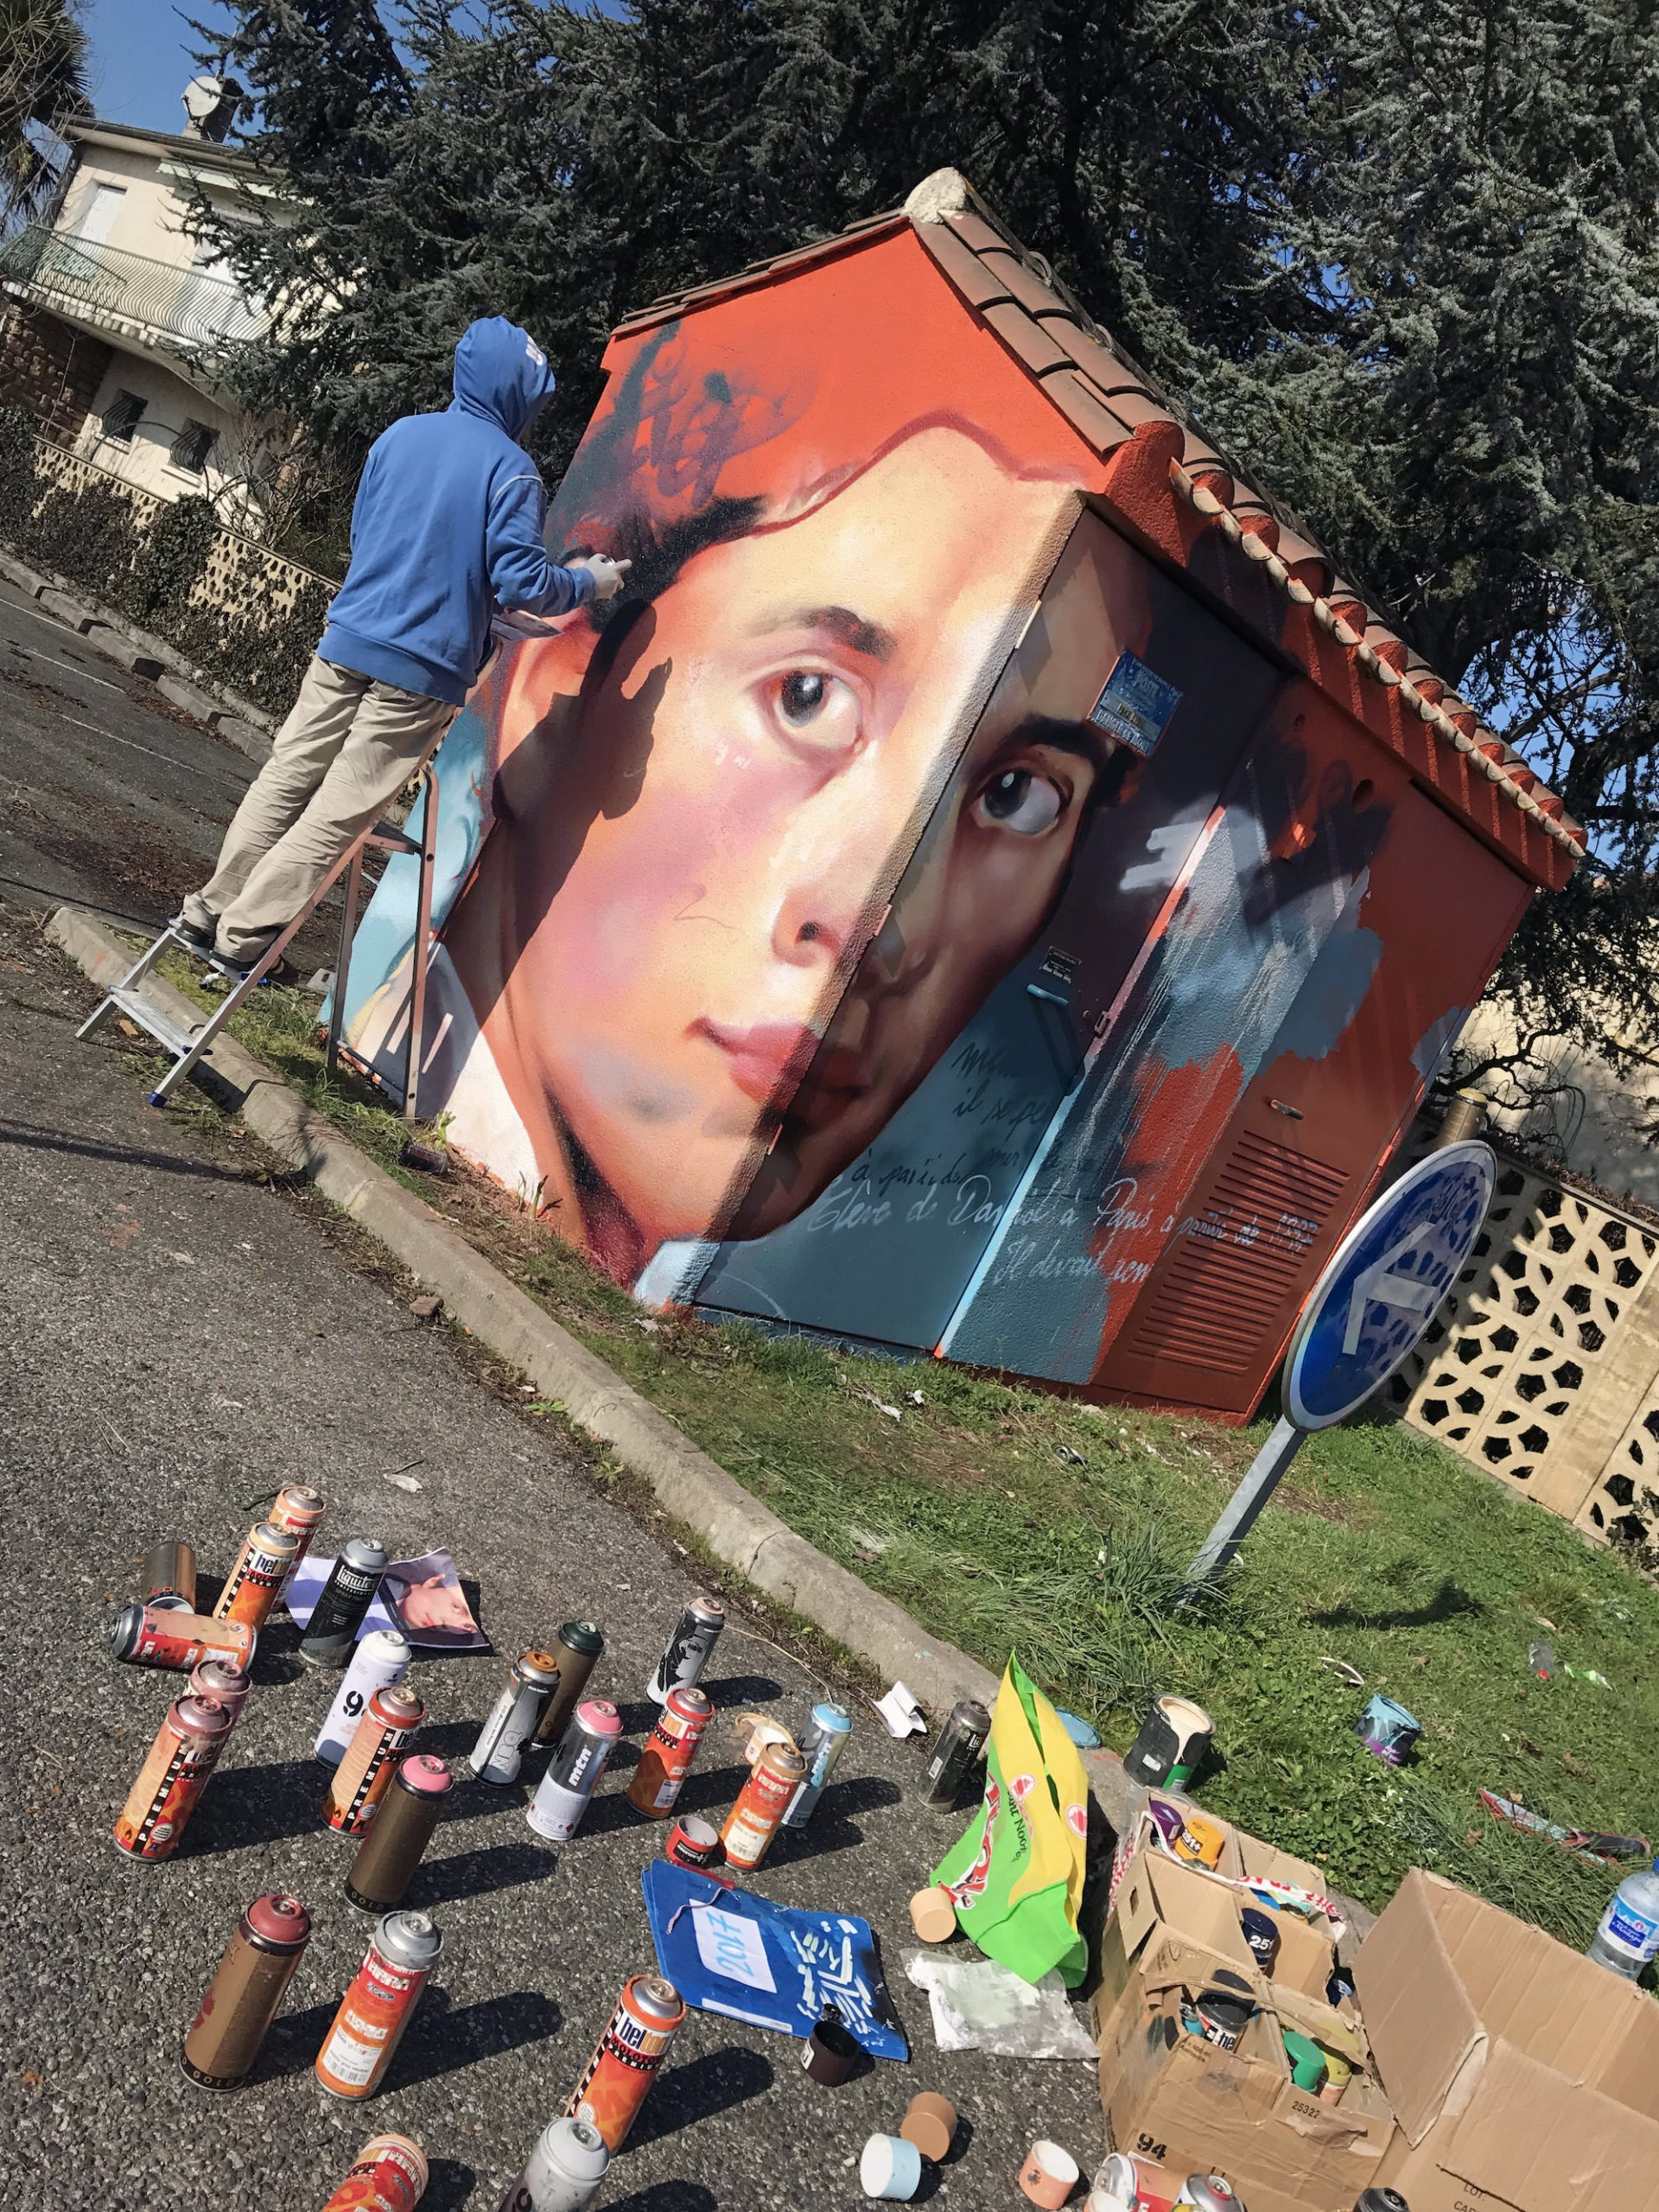 Ingres-graffiti-poste-transformation-portrait-art-fresque